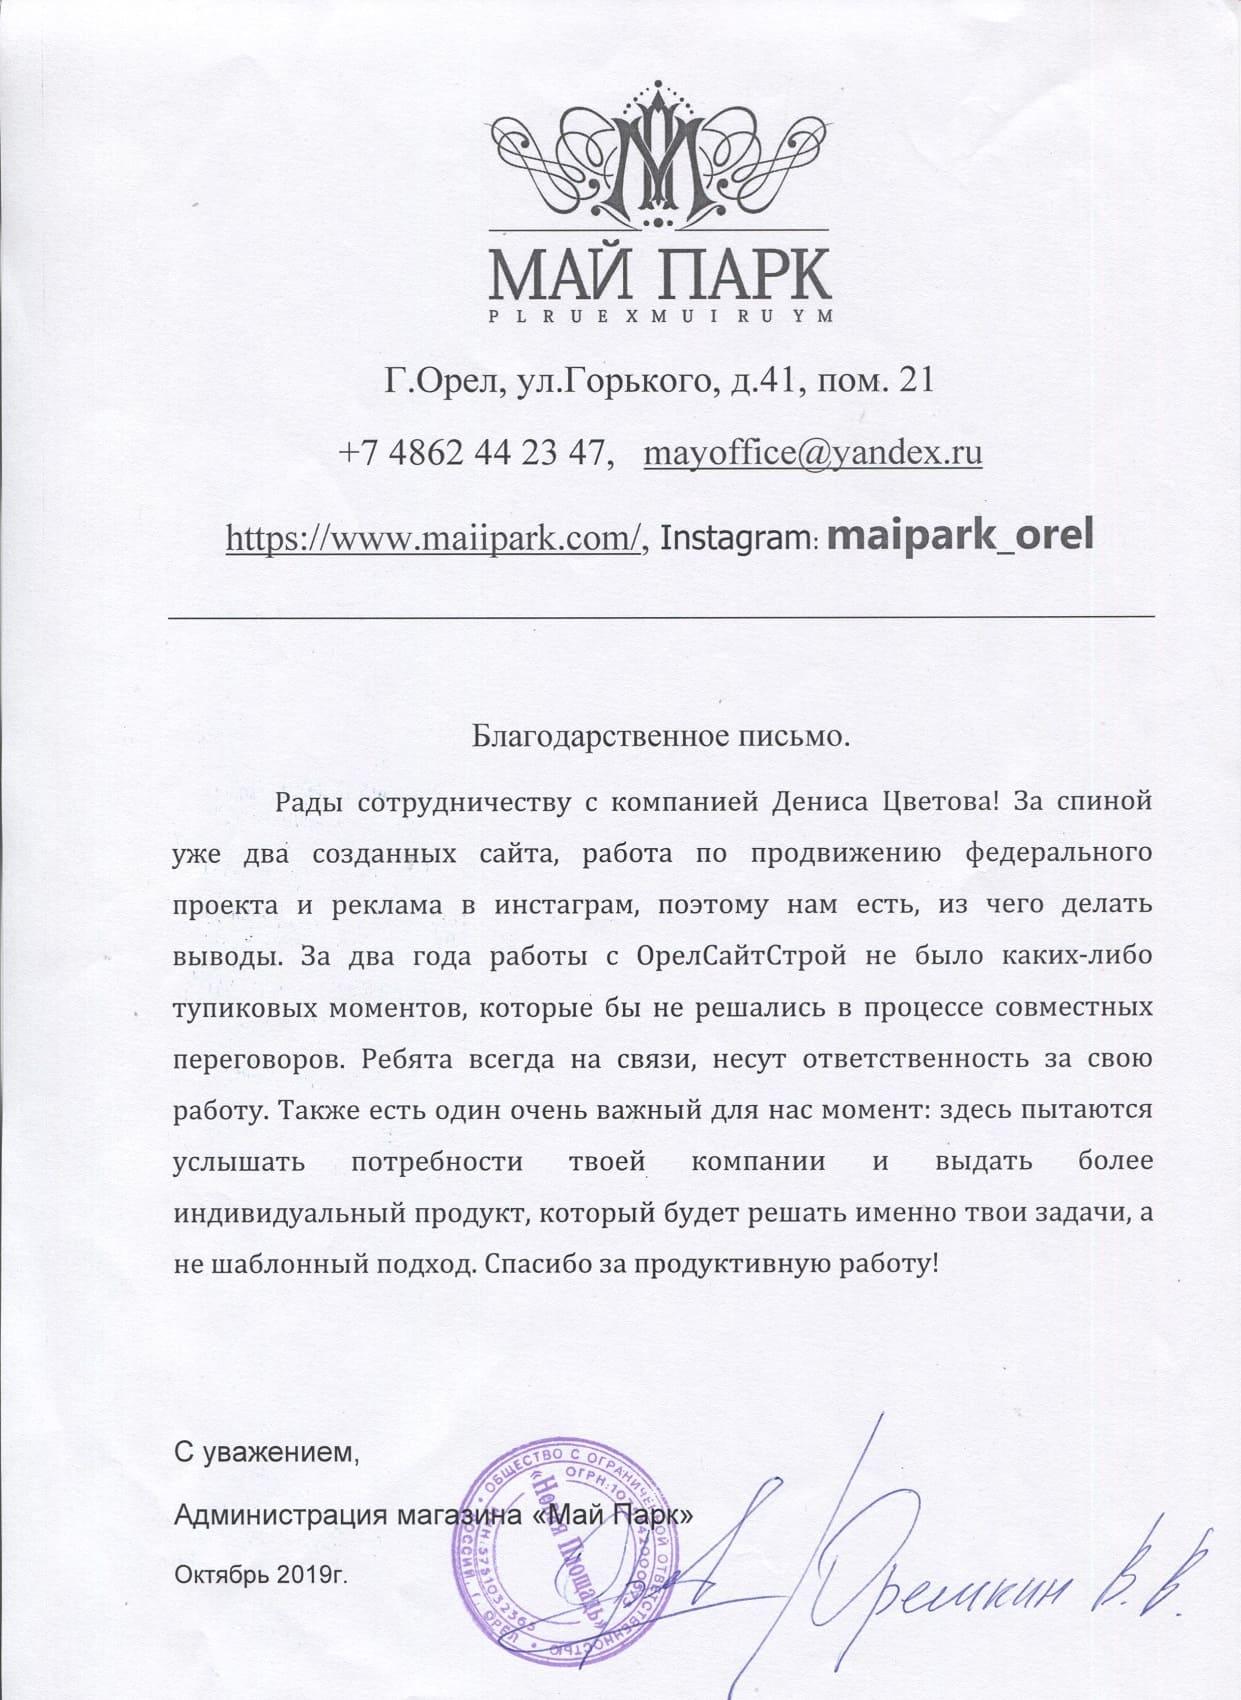 Отзыв «Май Парк» о компании ОрёлСайтСтрой